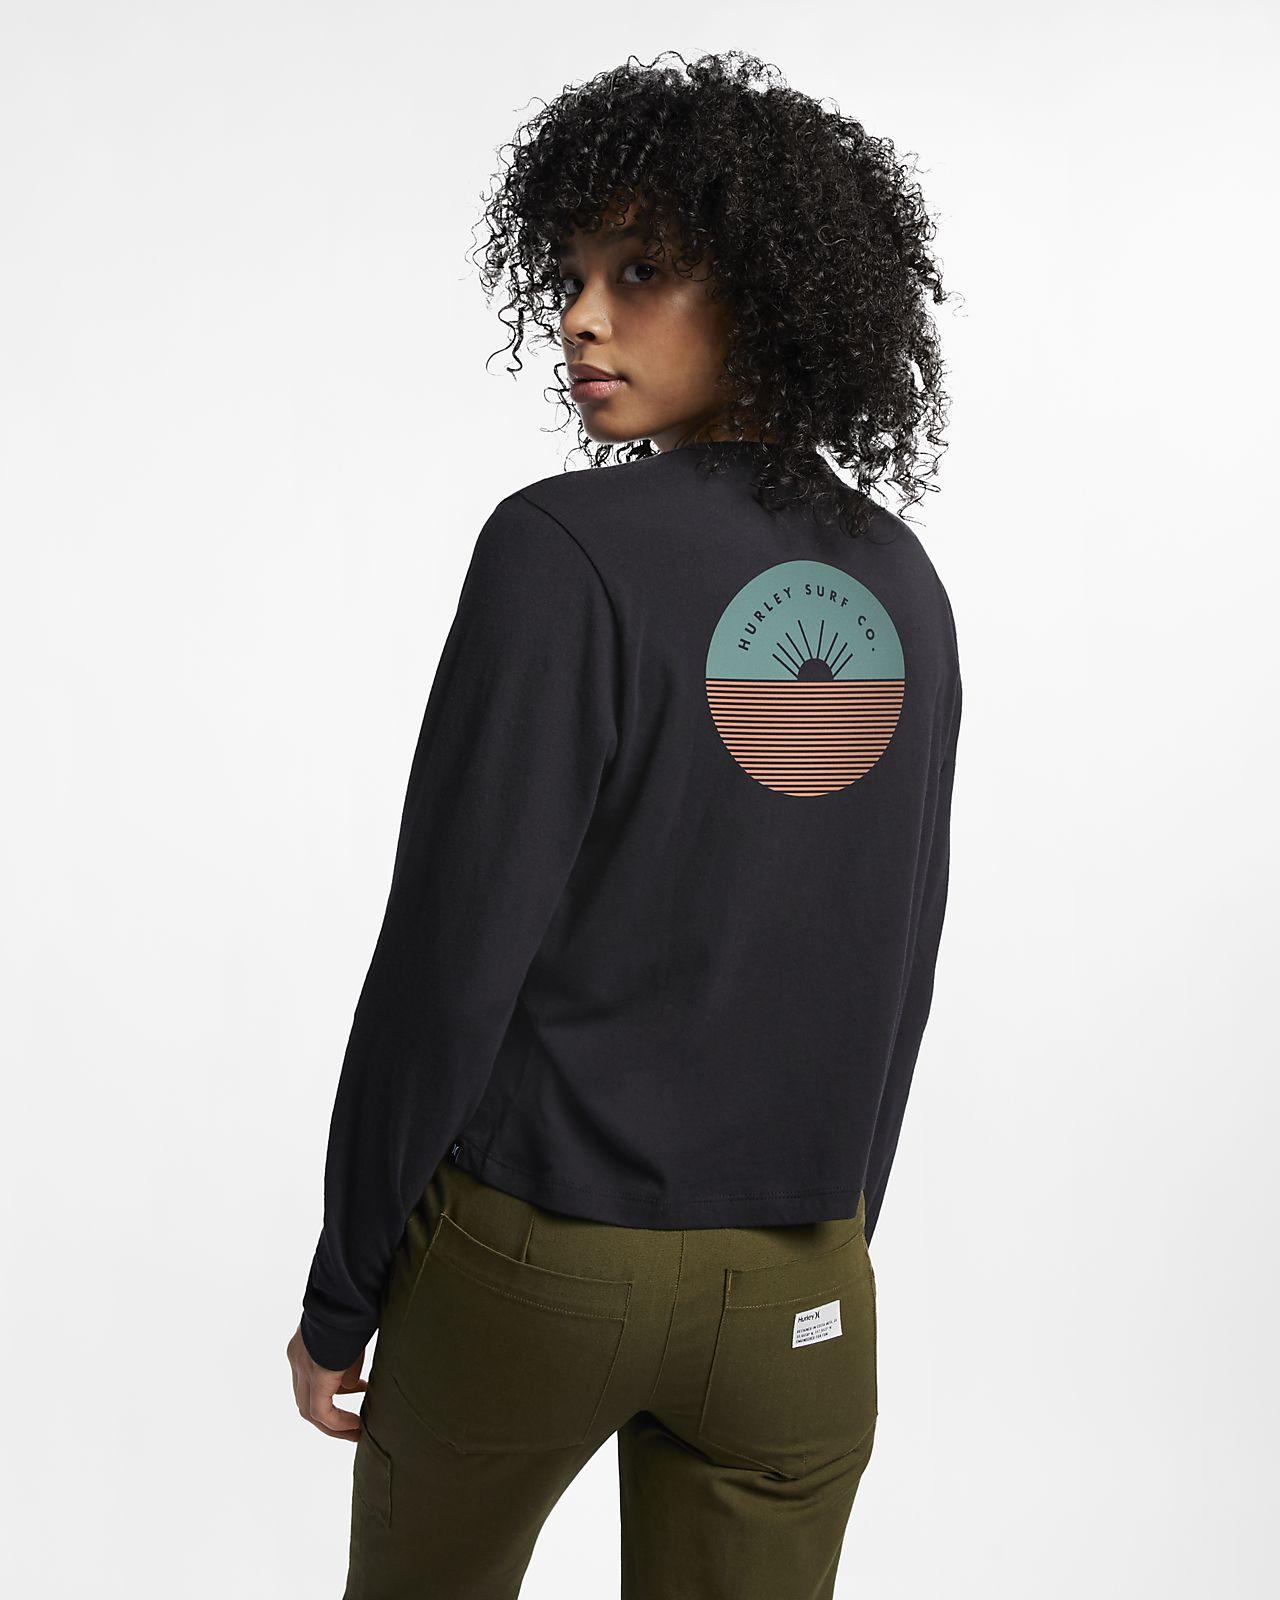 Tee-shirt à manches longues Hurley Horizon Perfect pour Femme